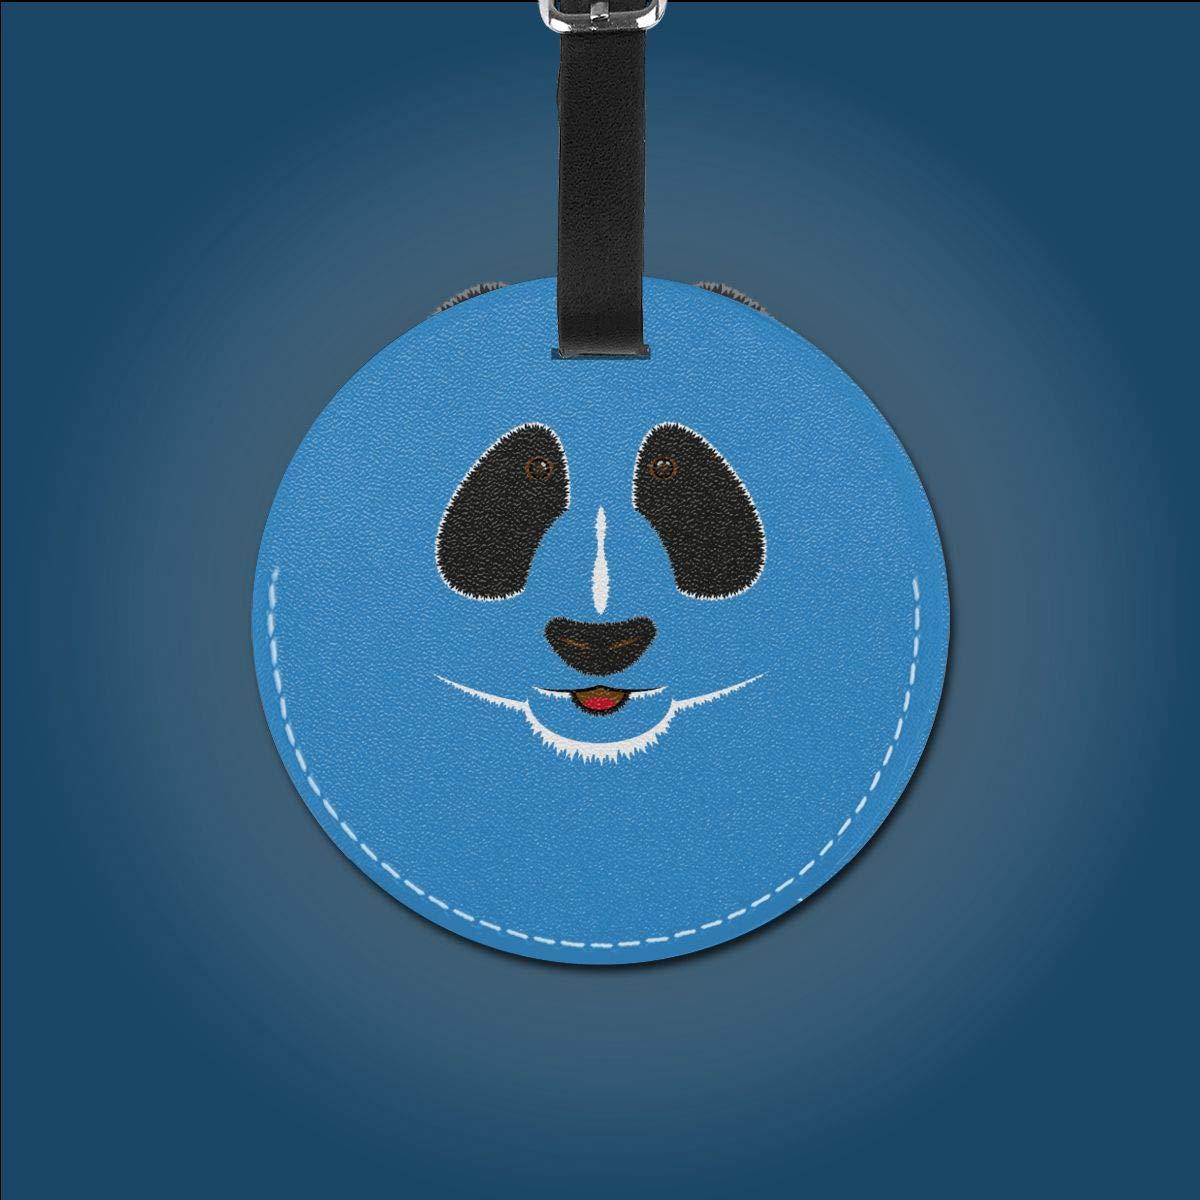 1pcs,2pcs,4pcs Panda Face Artwork Pu Leather Double Sides Print Round Luggage Tag Mutilple Packs